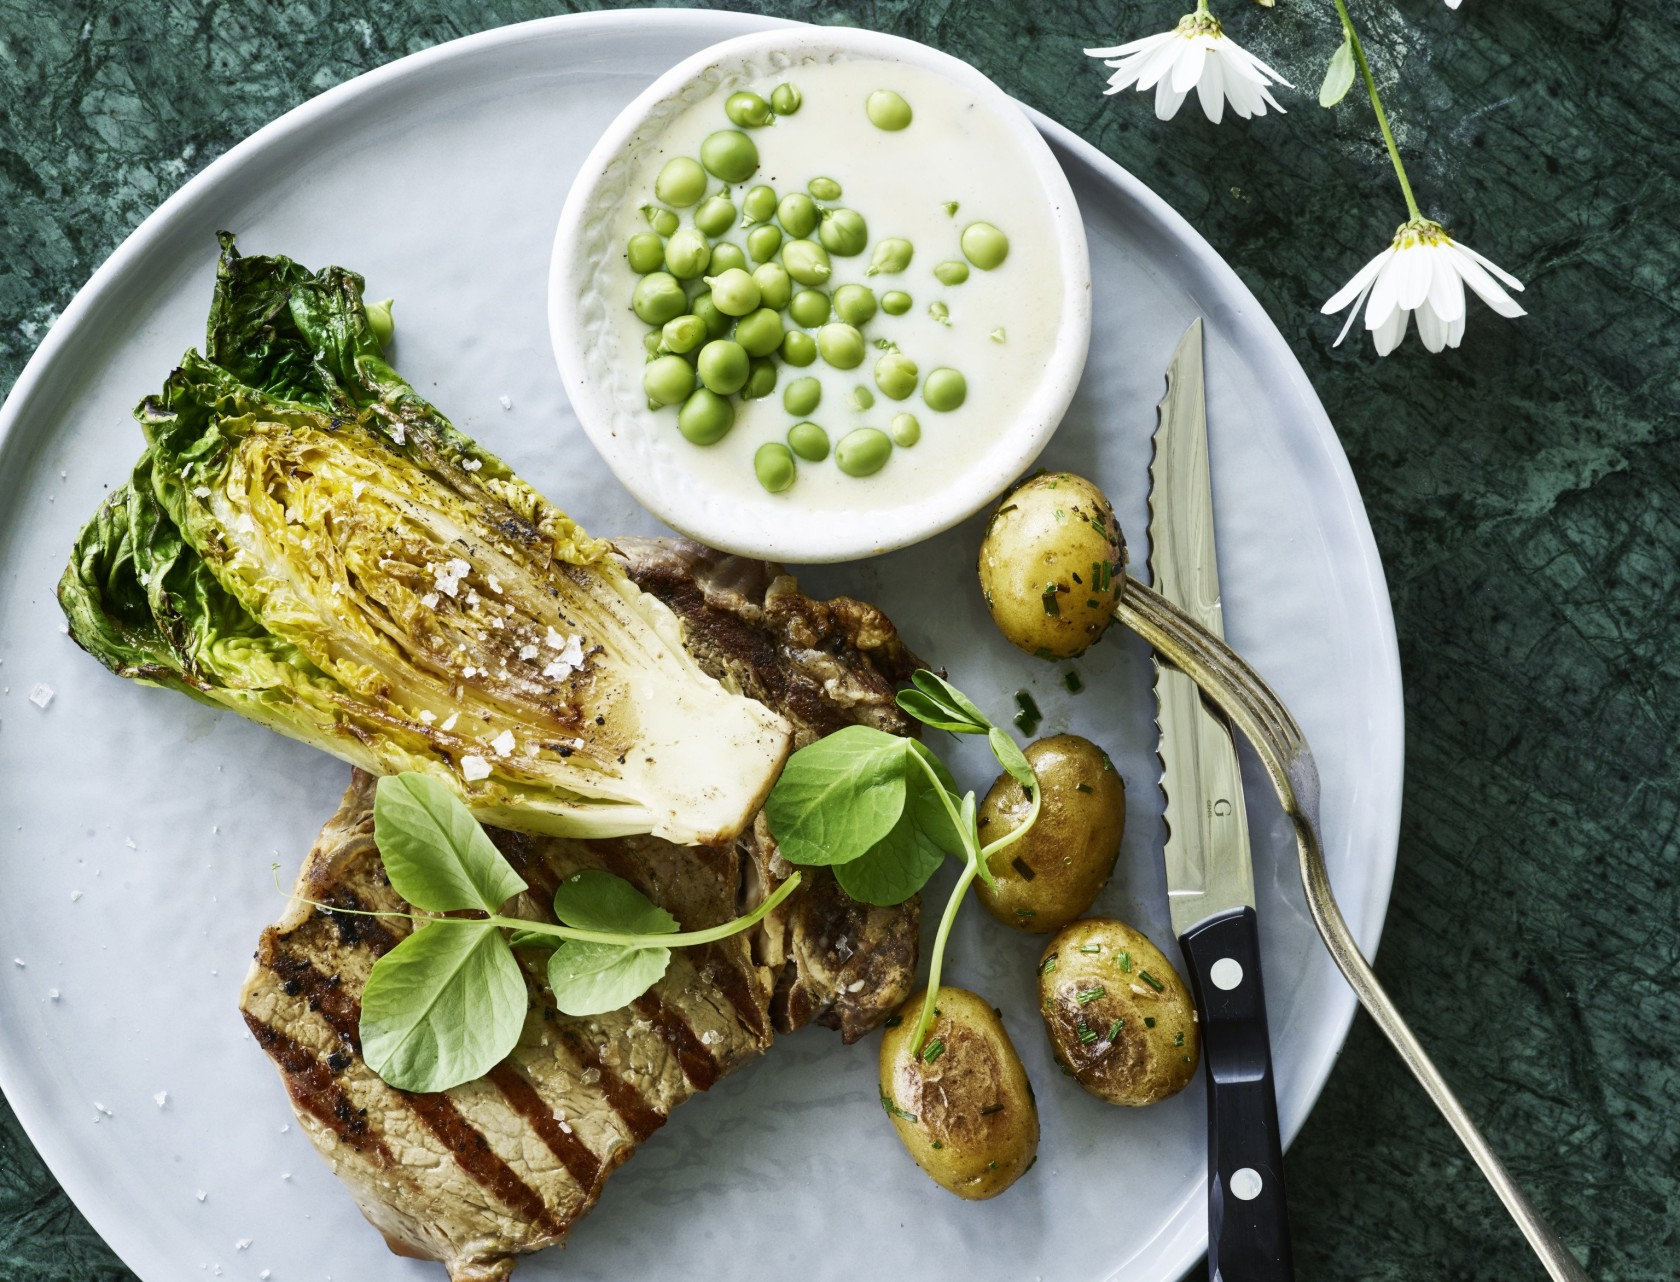 Ribeye og grillet hjertesalat - perfekt sommermad!